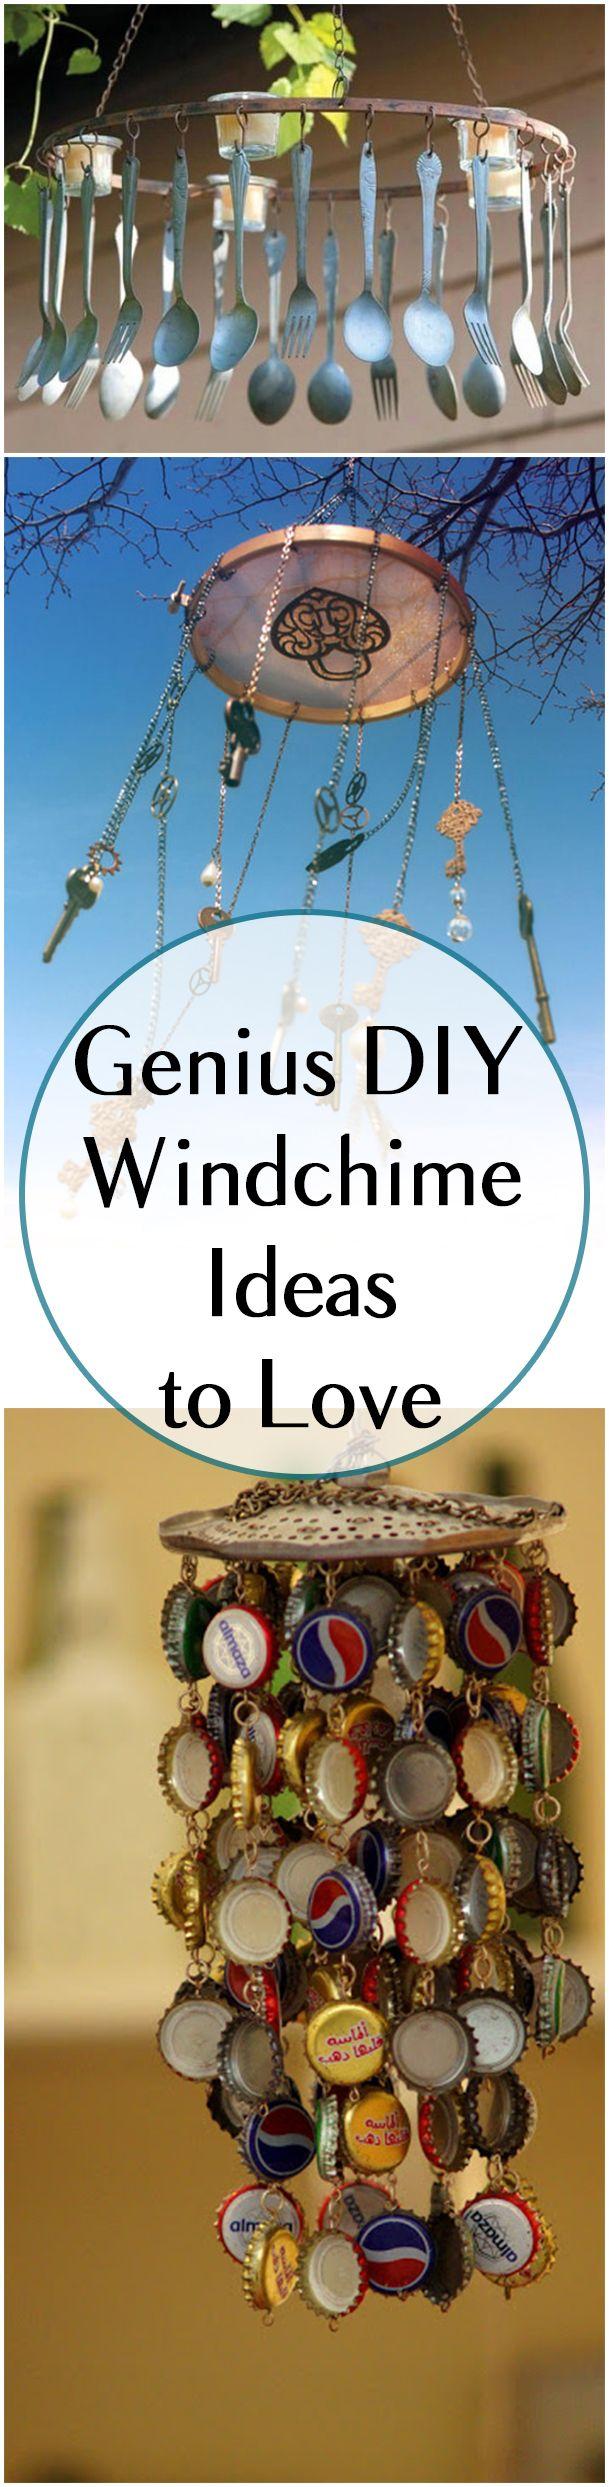 Homemade garden art ideas - Diy Wind Chime Ideas To Love